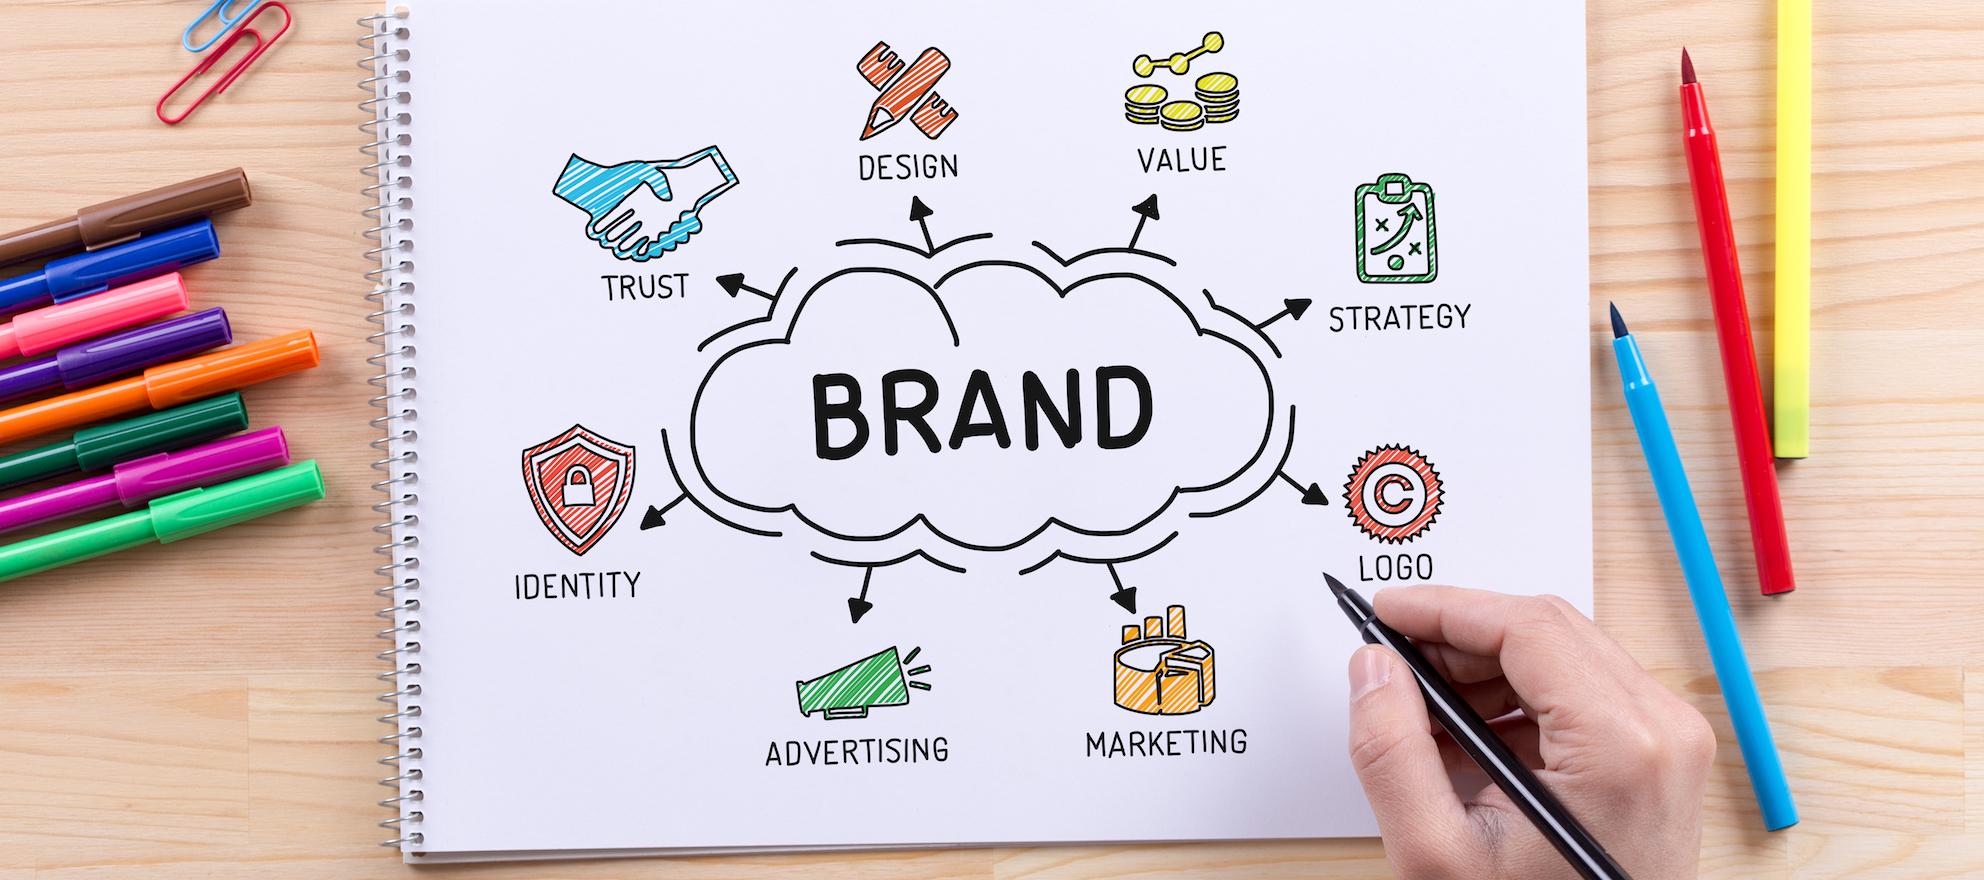 brand identity, real estate team